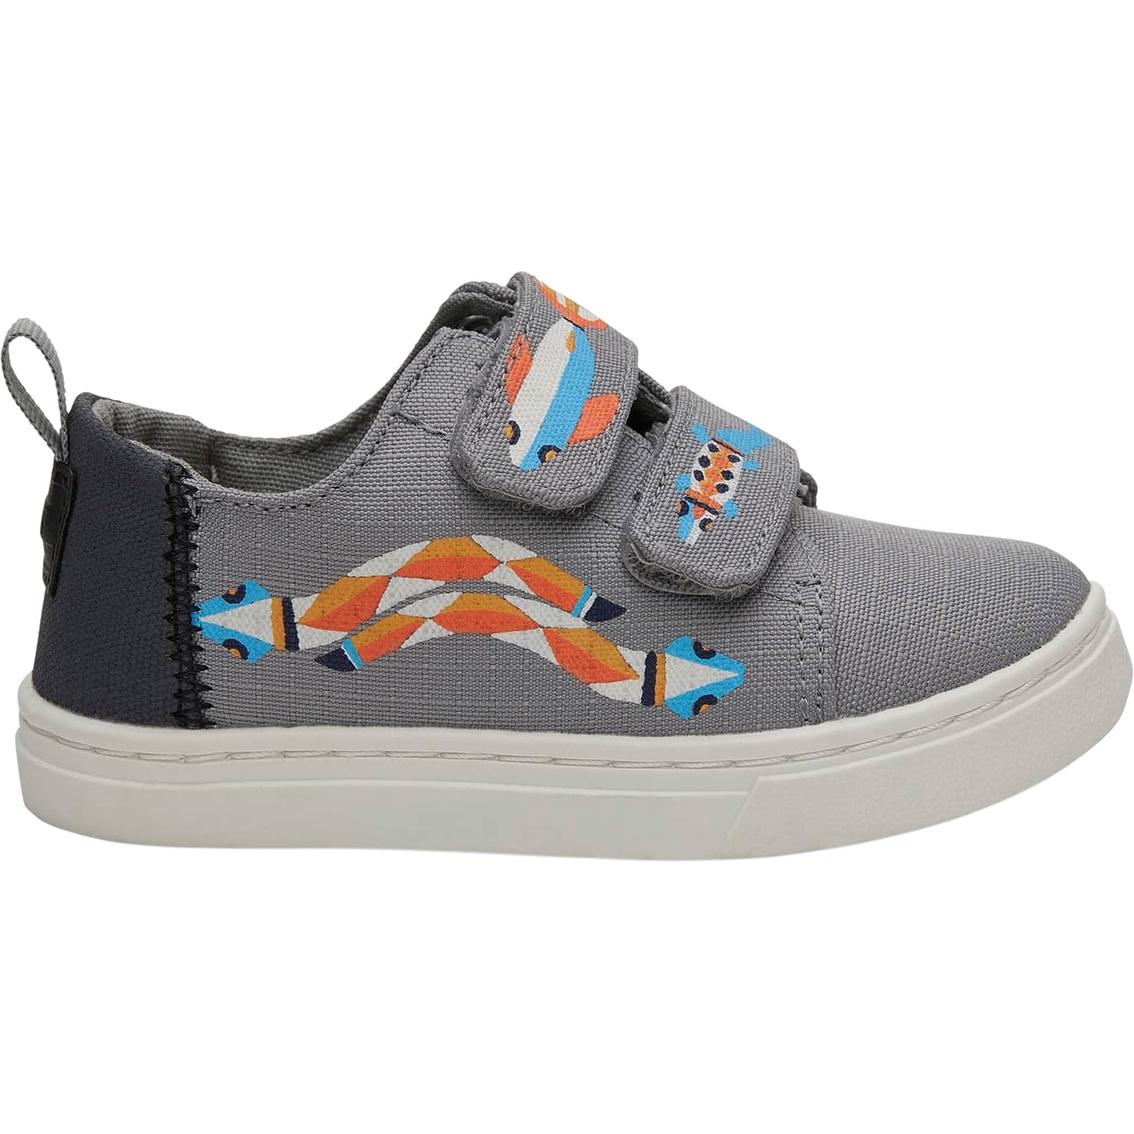 Toms Boys Tiny Lenny Ripstop Sneakers